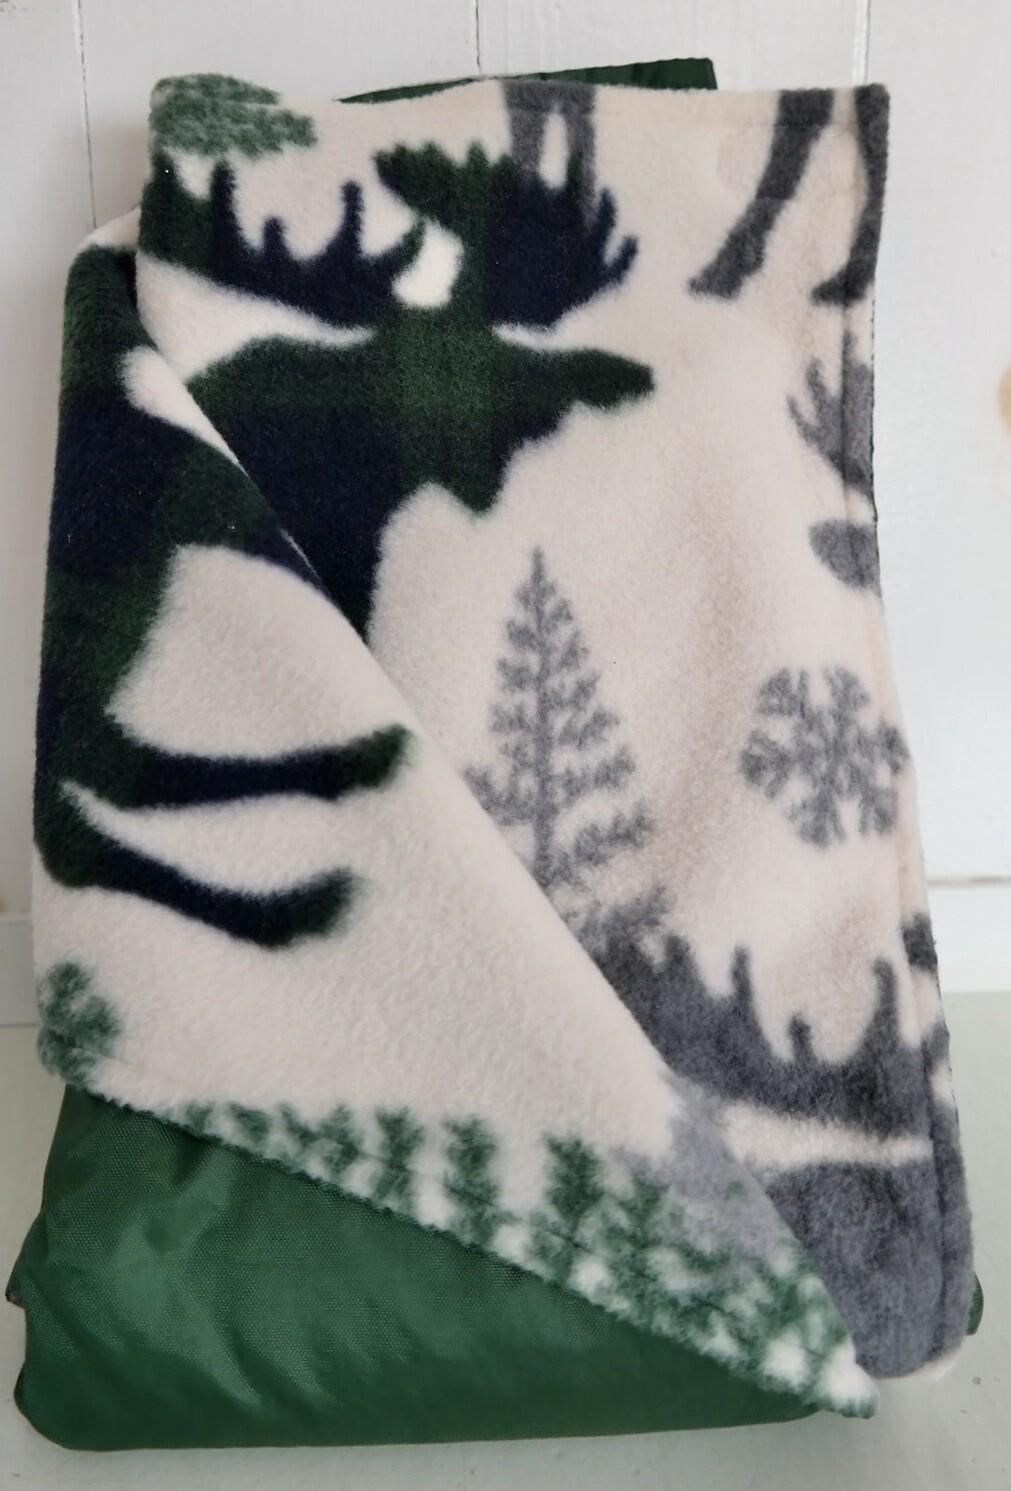 Maine River Otter Blanket 3C Green Moose